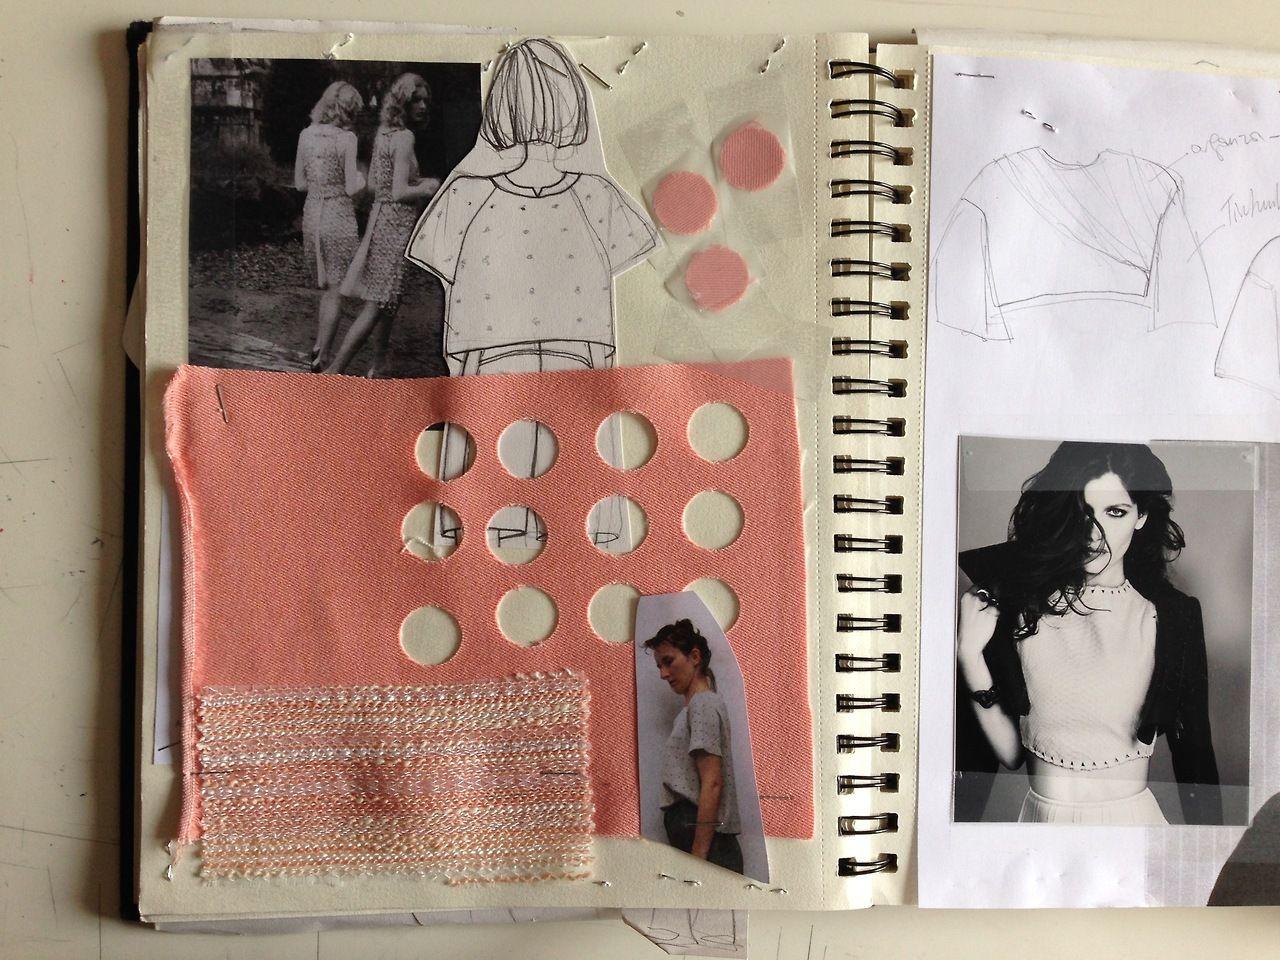 Fashion Sketchbook Fashion Design Process With Research Sketching Fabric Sampling De Fashion Sketchbook Inspiration Sketch Book Fashion Design Sketchbook